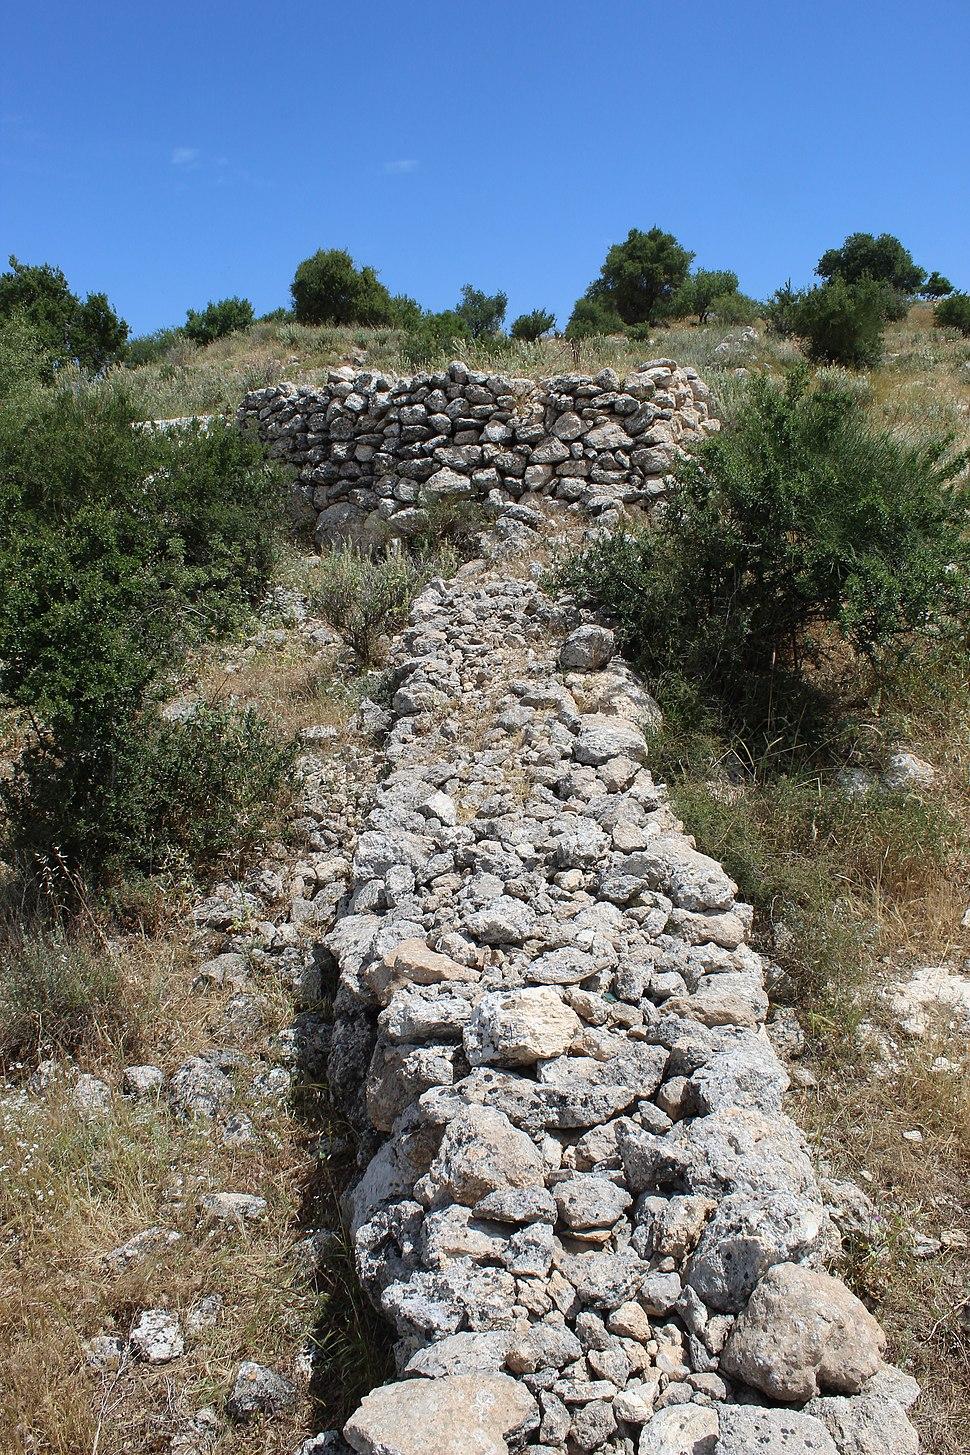 Walled structures at Bayt Nattif